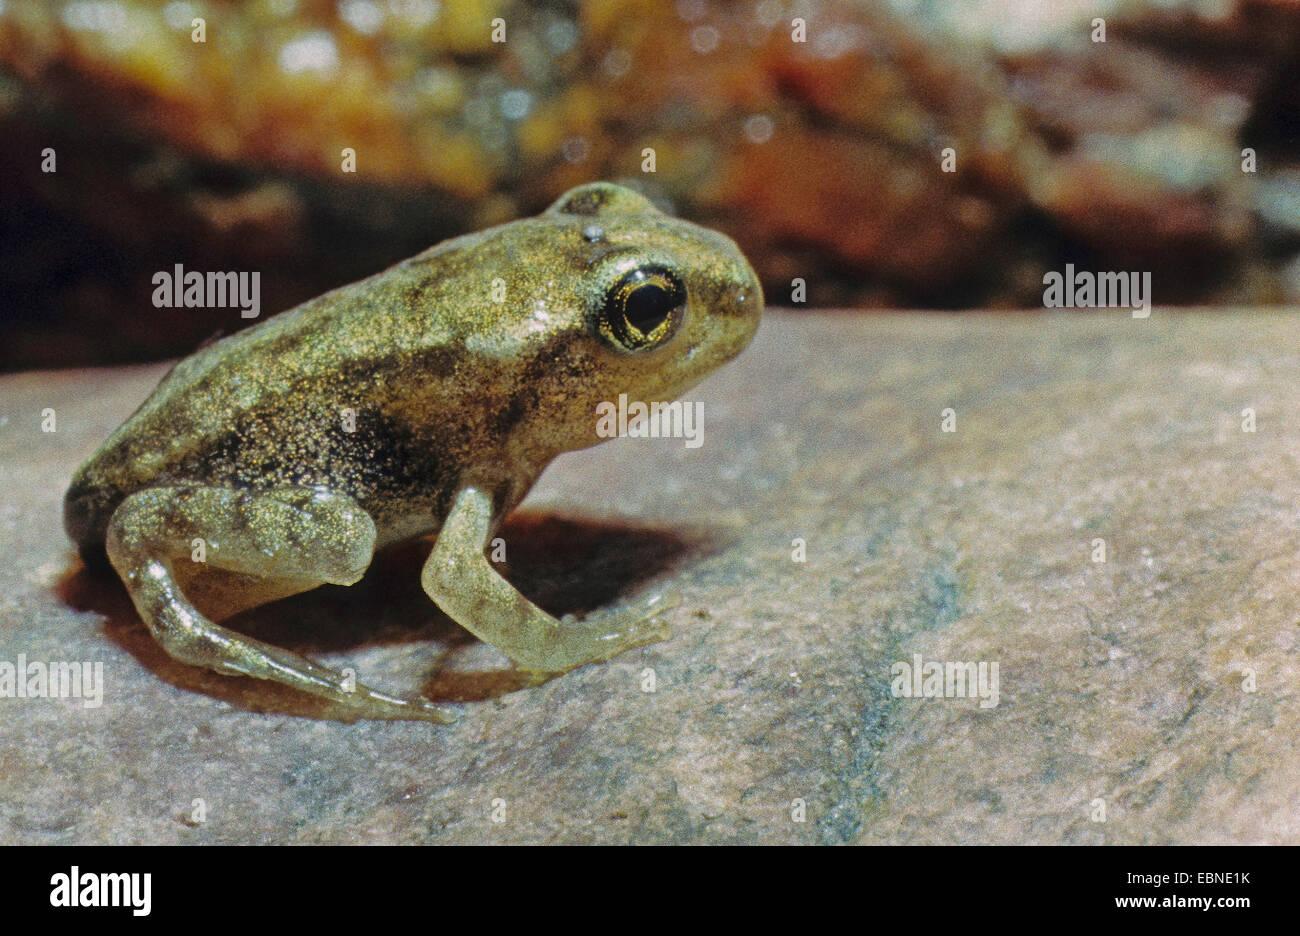 common frog, grass frog (Rana temporaria), young frog, metamorphosis, Germany - Stock Image